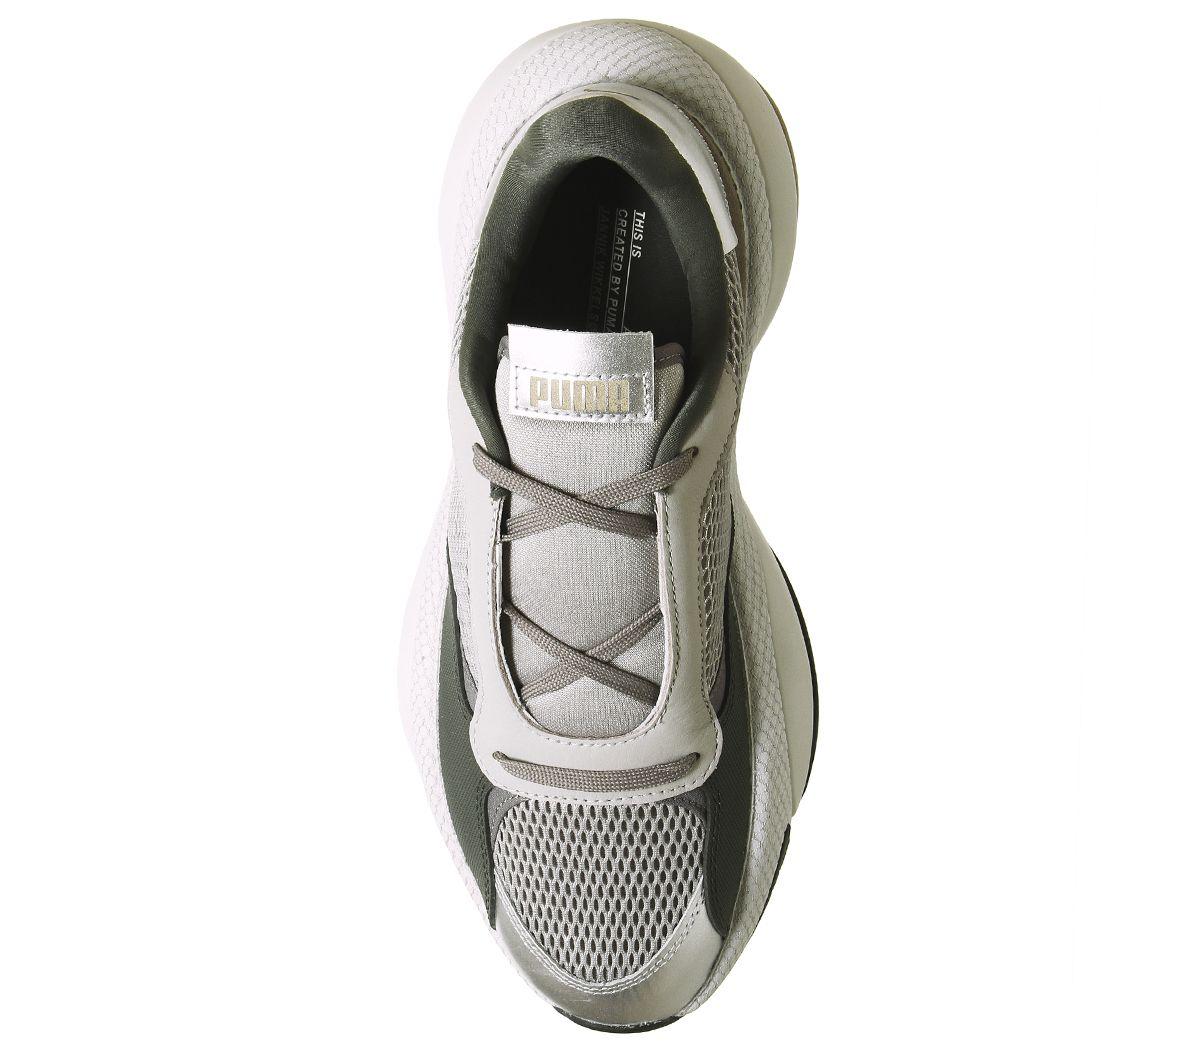 Puma-Alteration-Baskets-Puma-Silver-calcaire-Baskets-Chaussures miniature 3